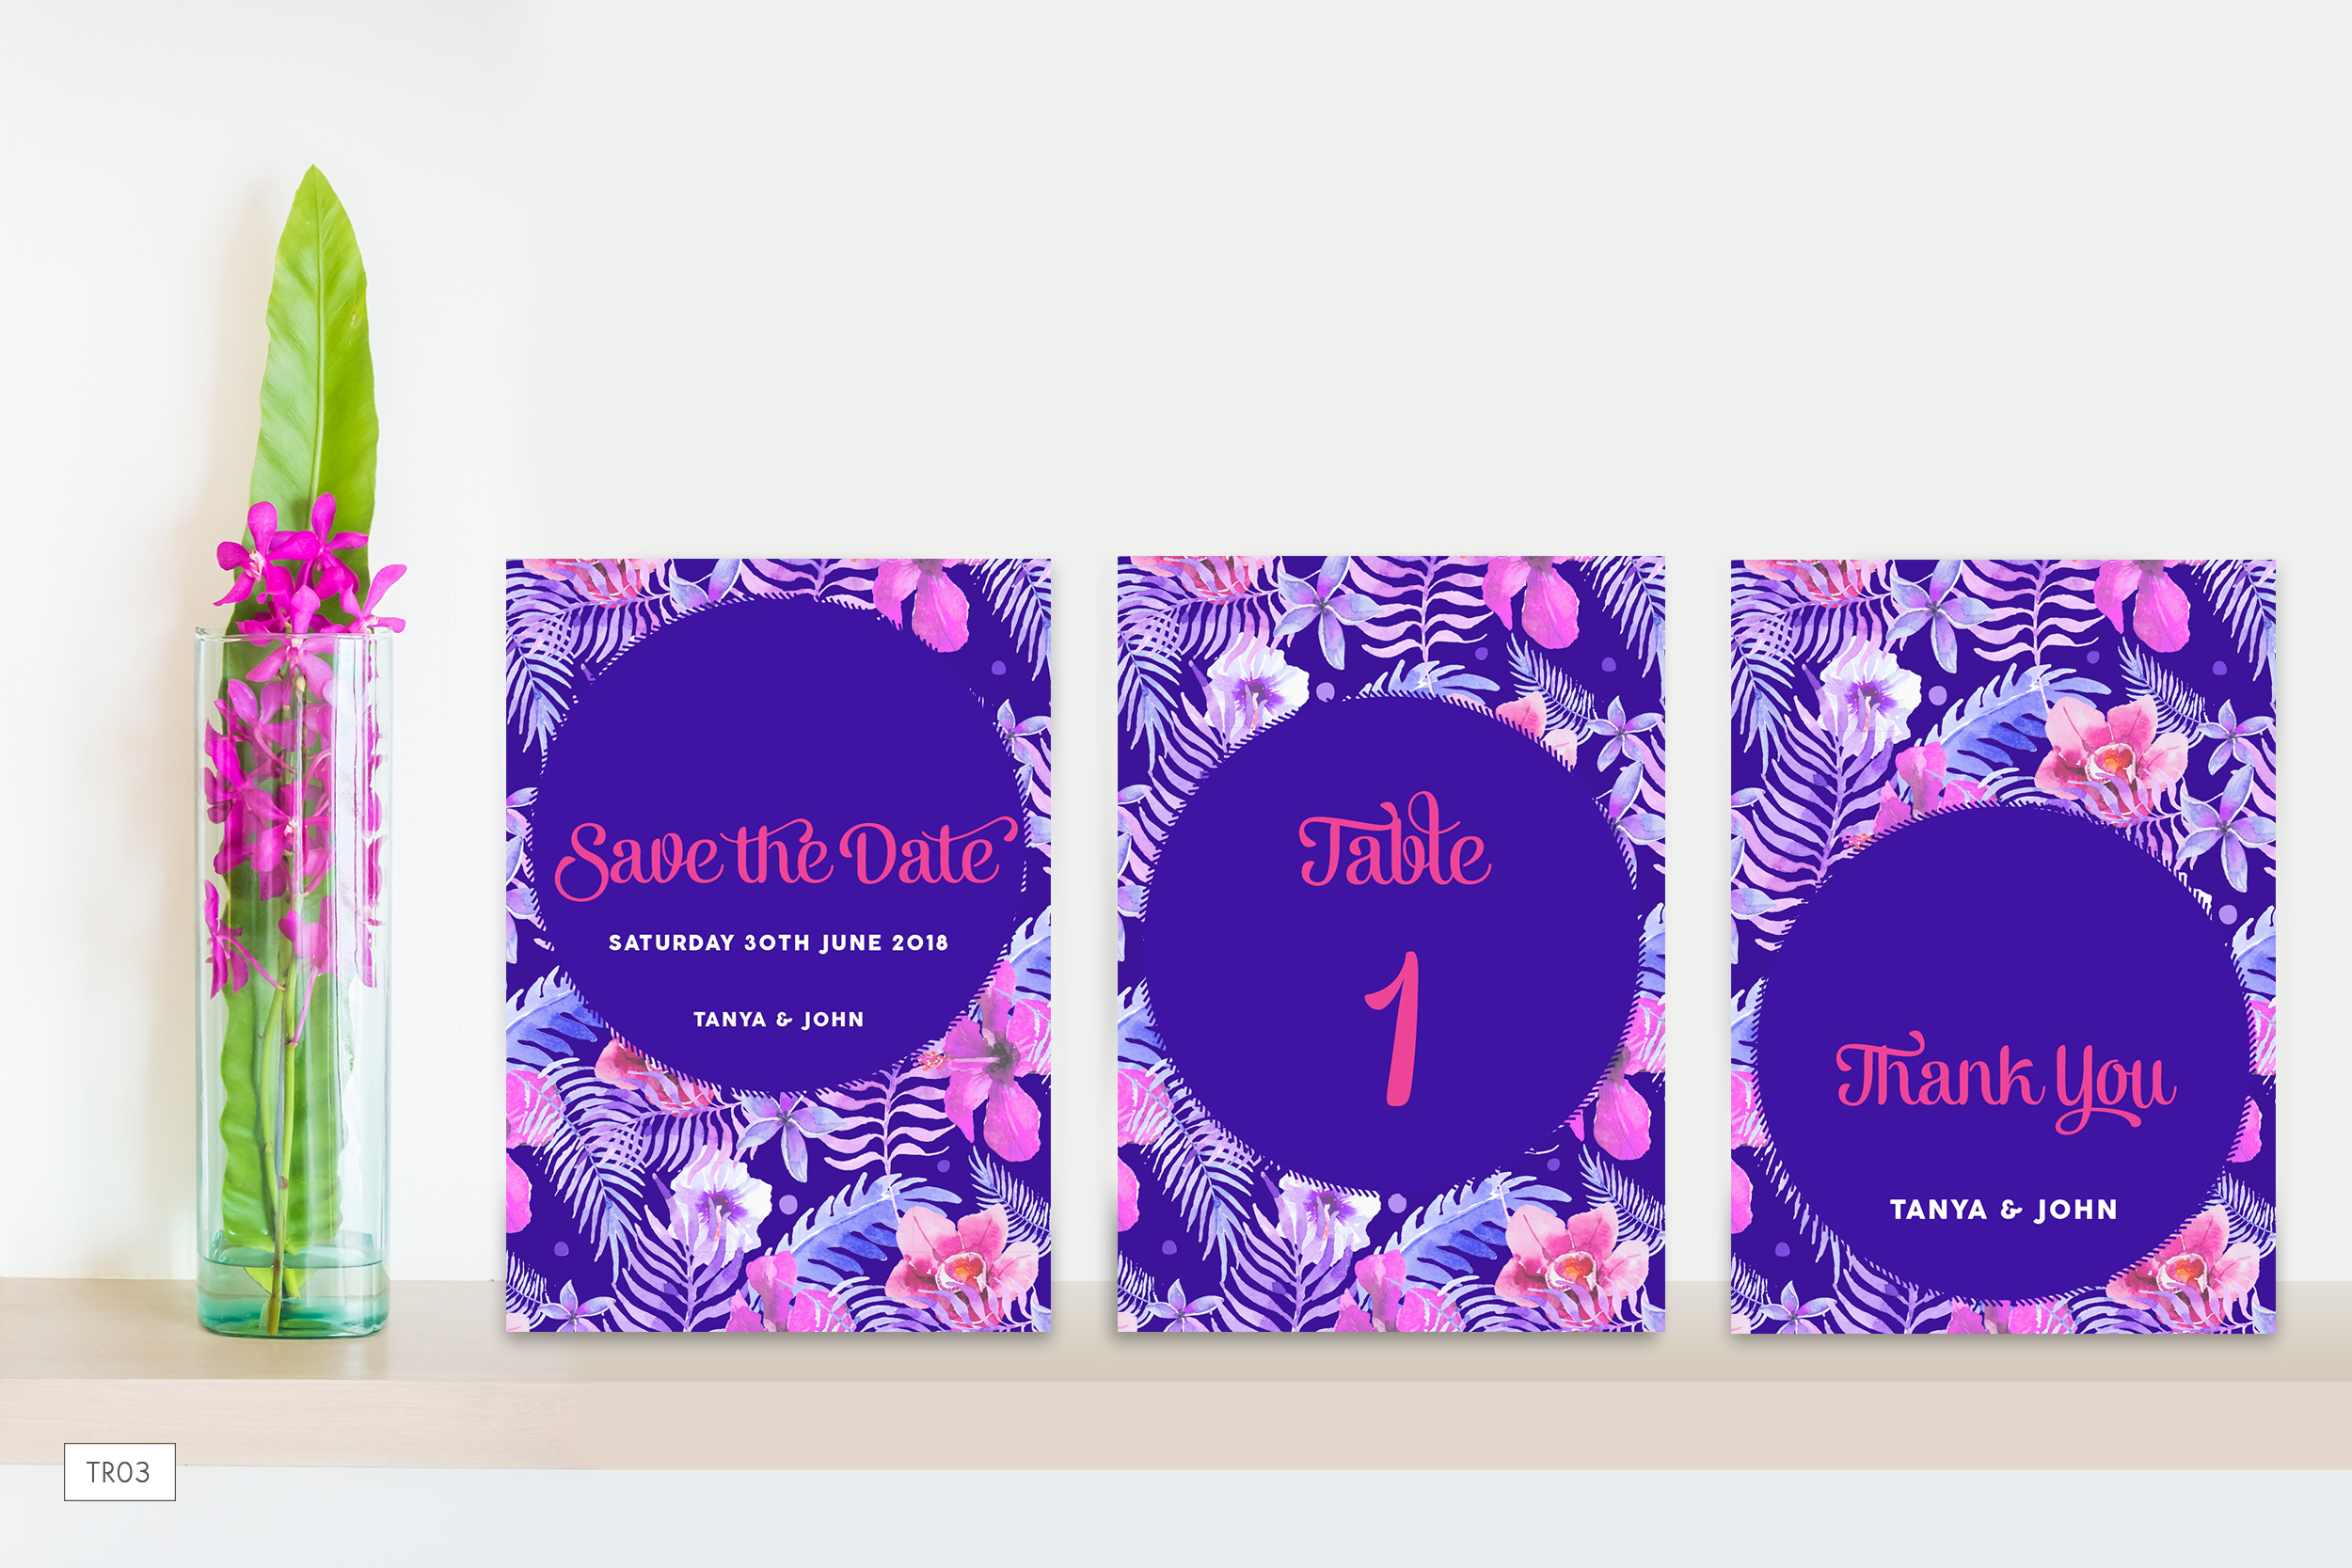 tr03-tropics-wedding-invitation-set.jpg